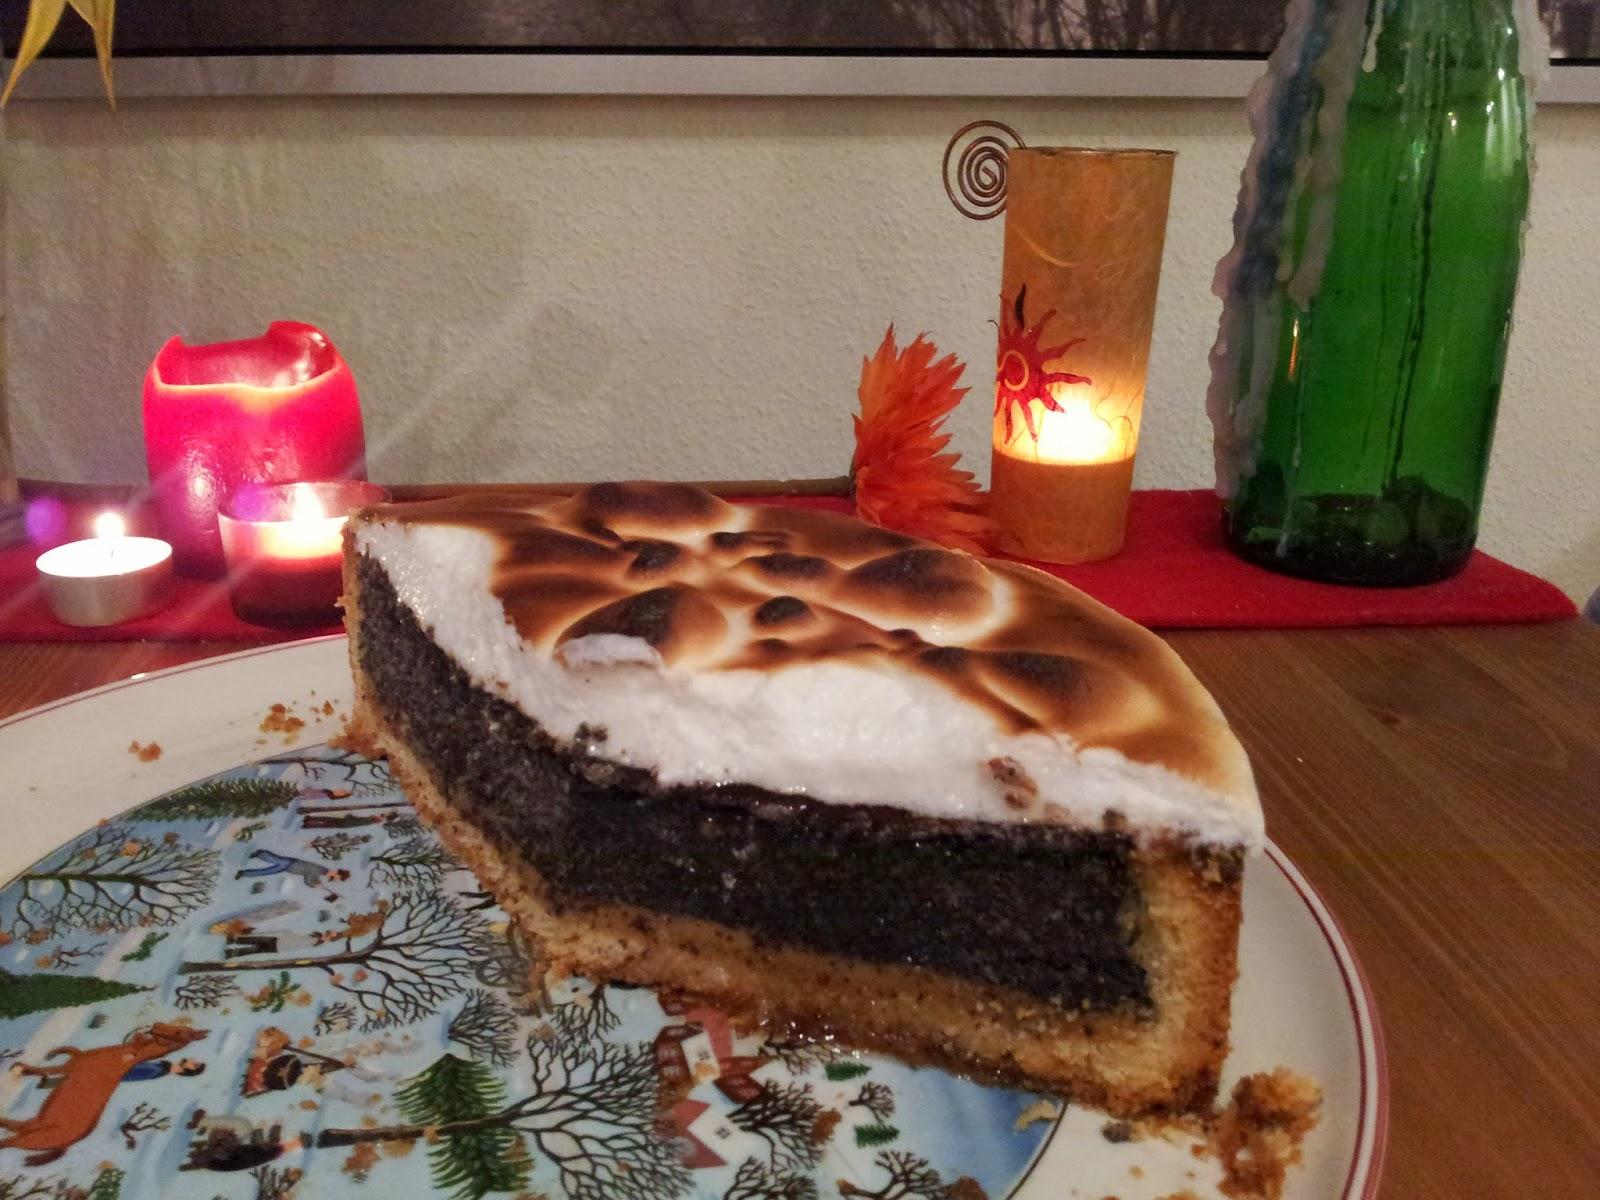 Kuchengasbrenner Mohn Marzipan Torte Mit Baiser Haube Himmlisch